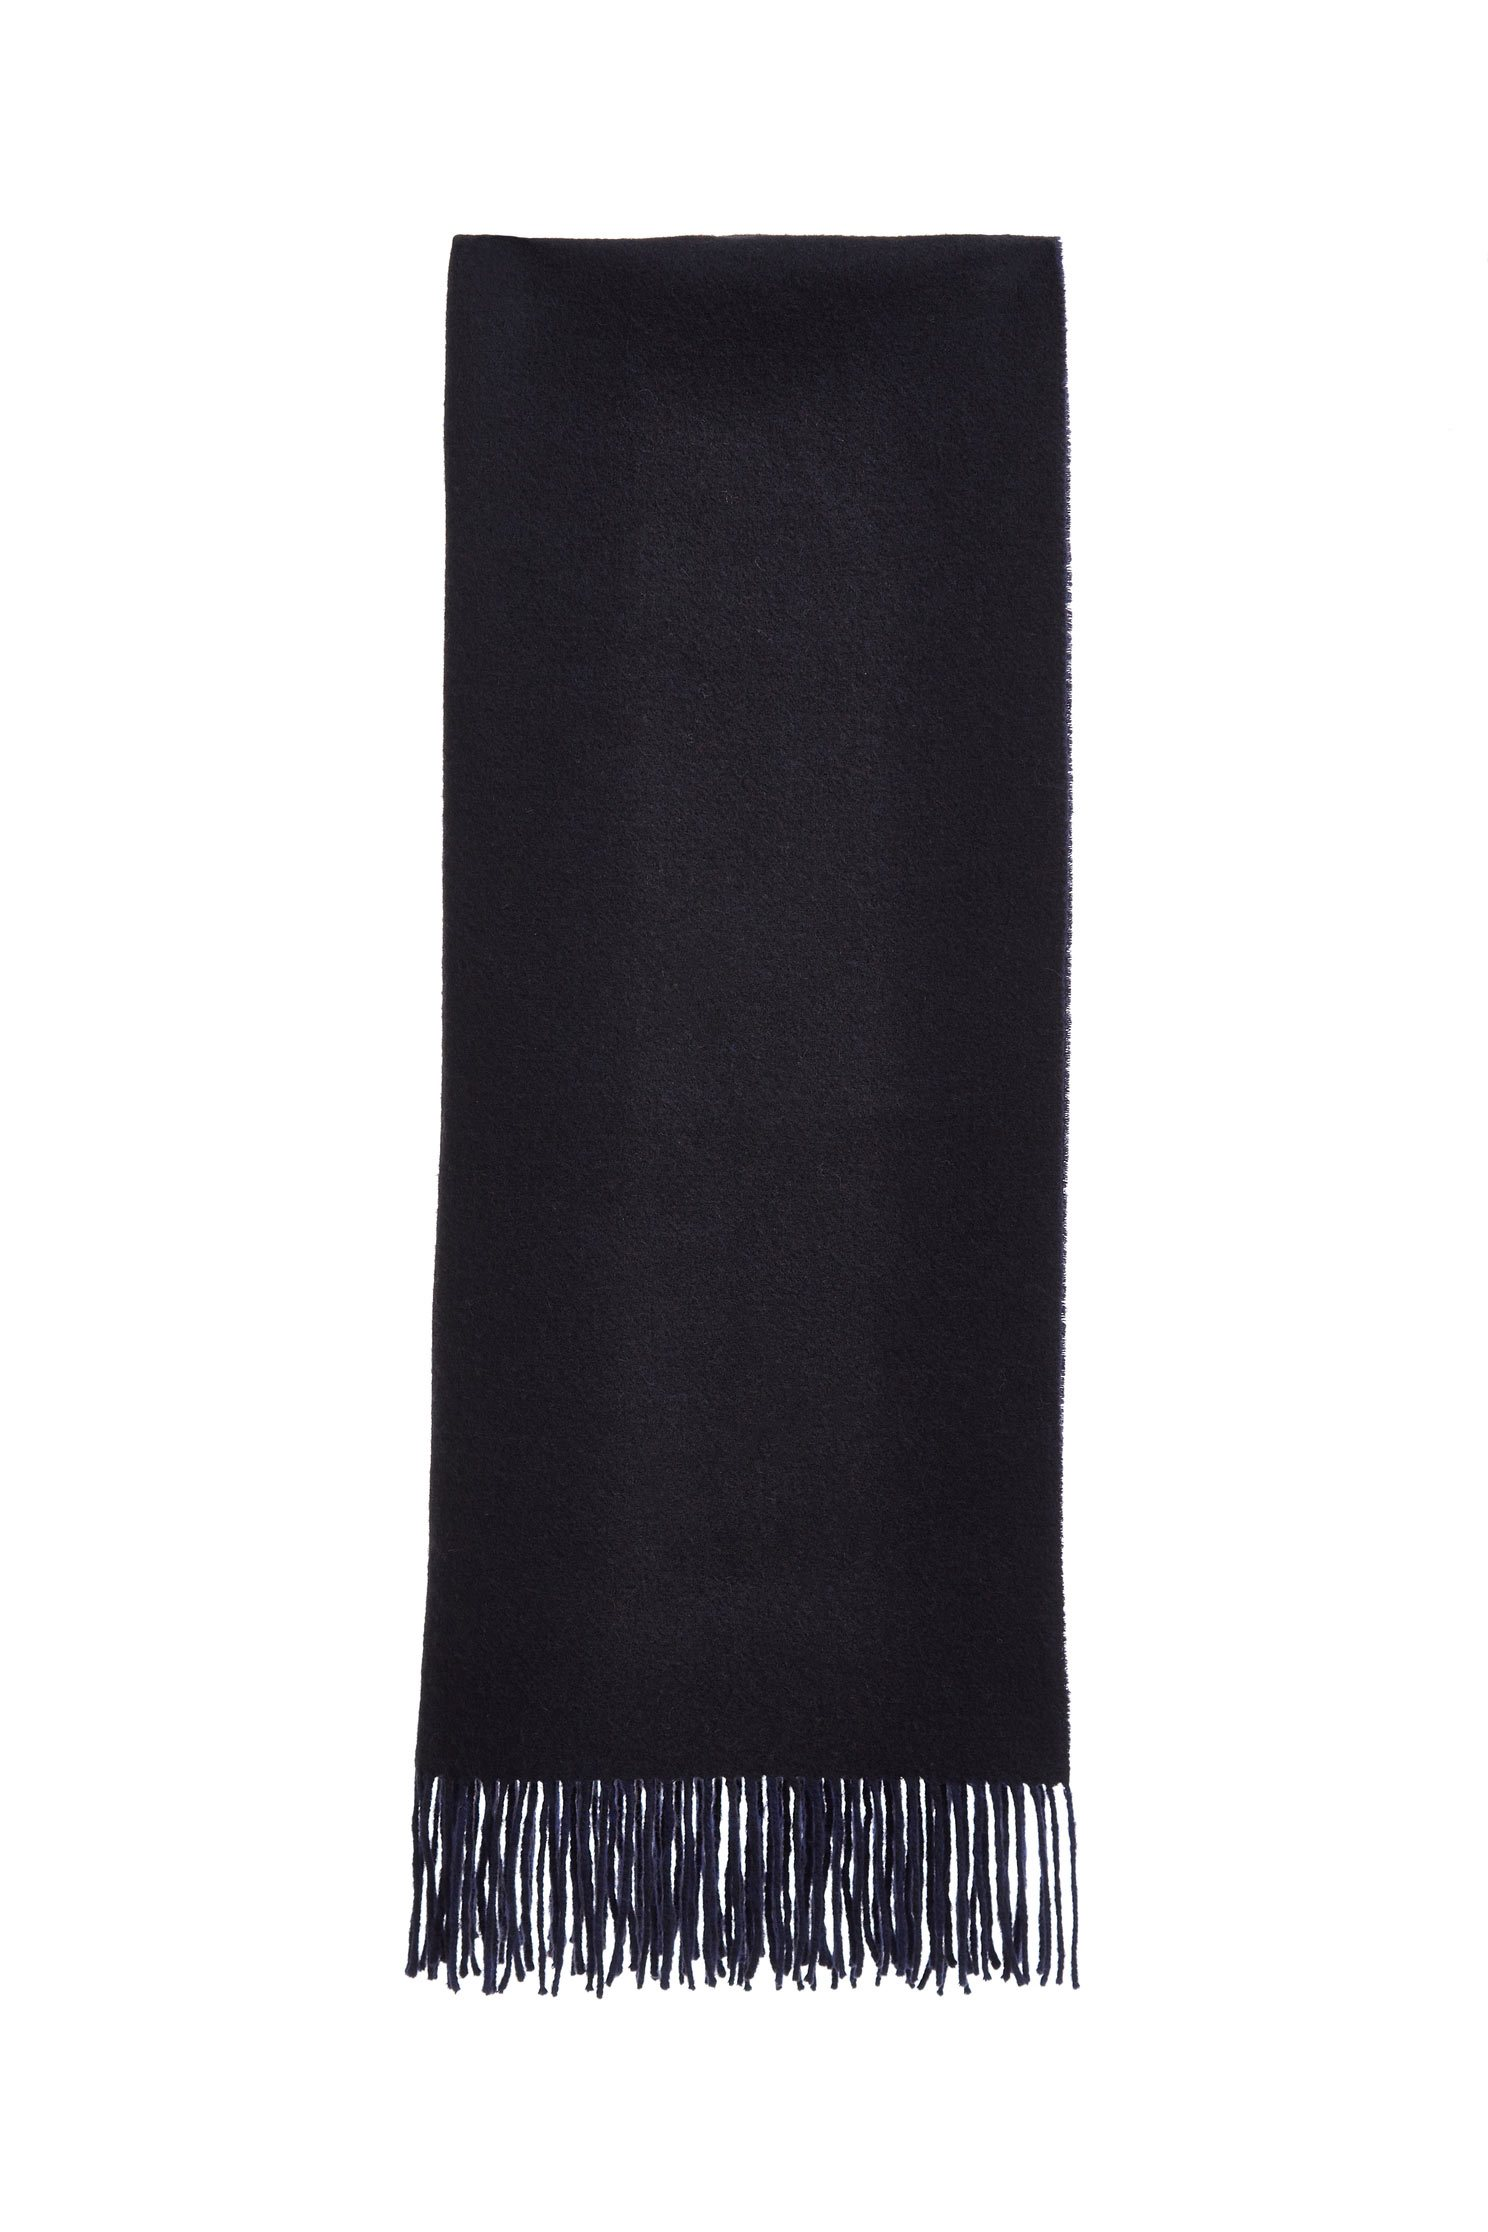 Basic knit scarf,coldforwinter,scarf,purewool